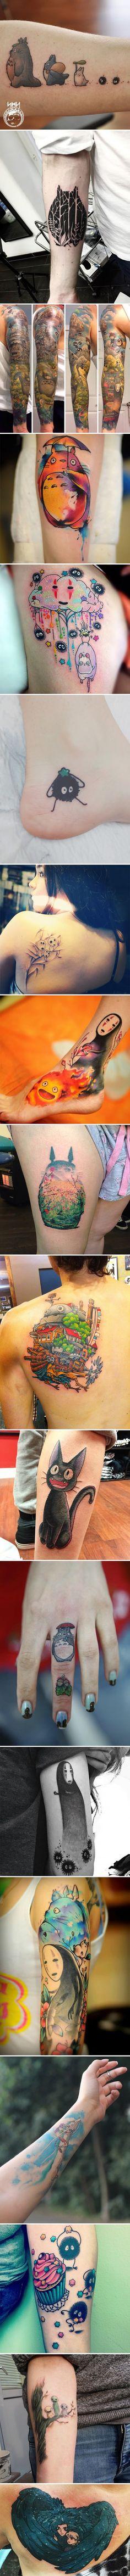 Studio Ghibli Tattoos Inspired By Miyazaki Films